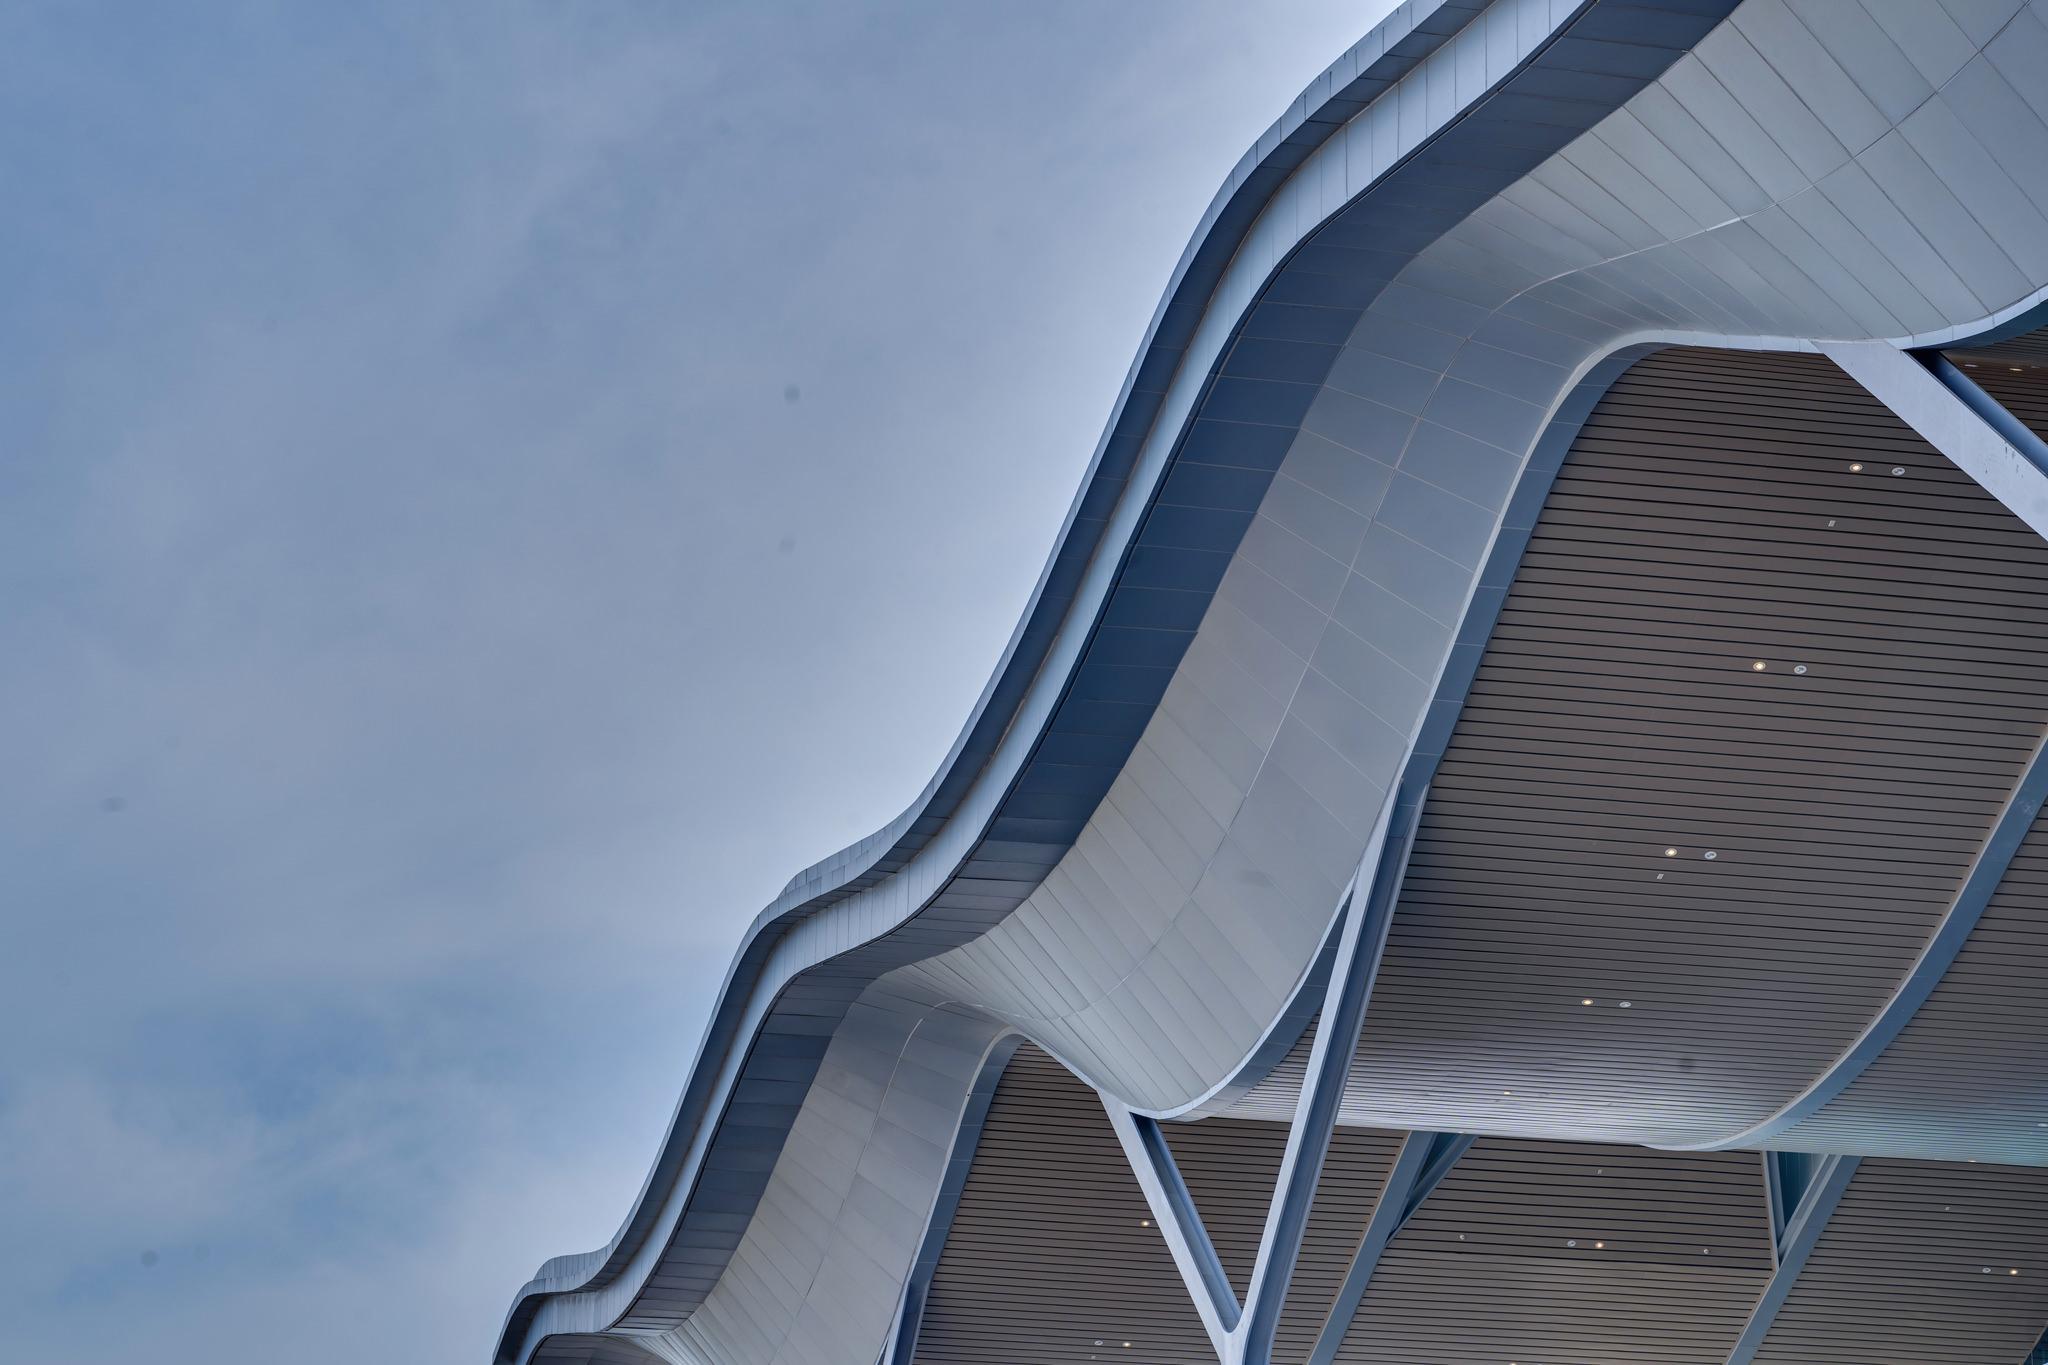 20180626 - Cam Ranh Airport - Architecture - 0269.jpg